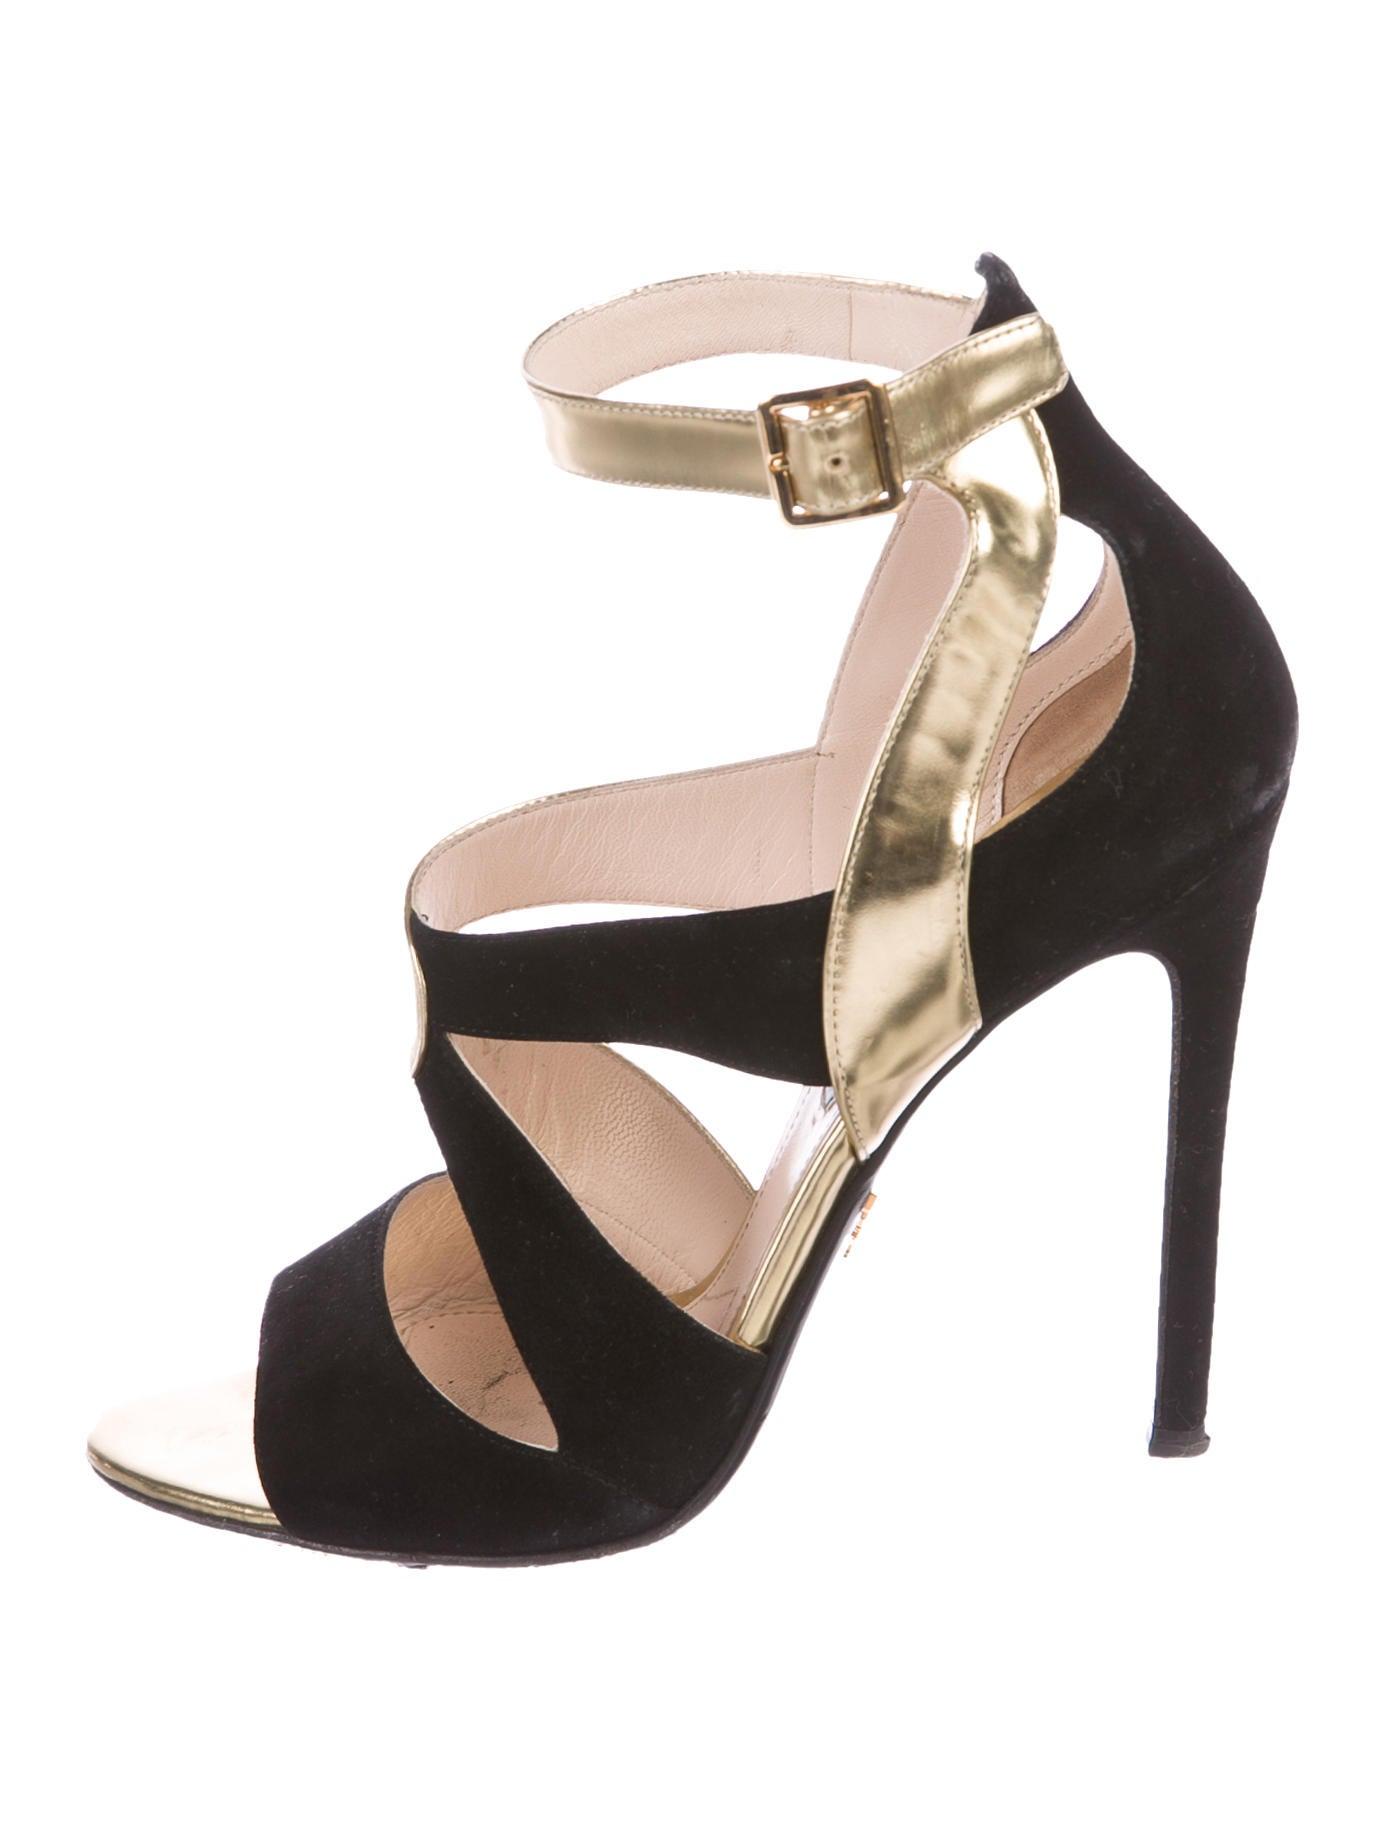 Prada Bi-Color Round Sandals Manchester cheap online lmz6M0mzG2